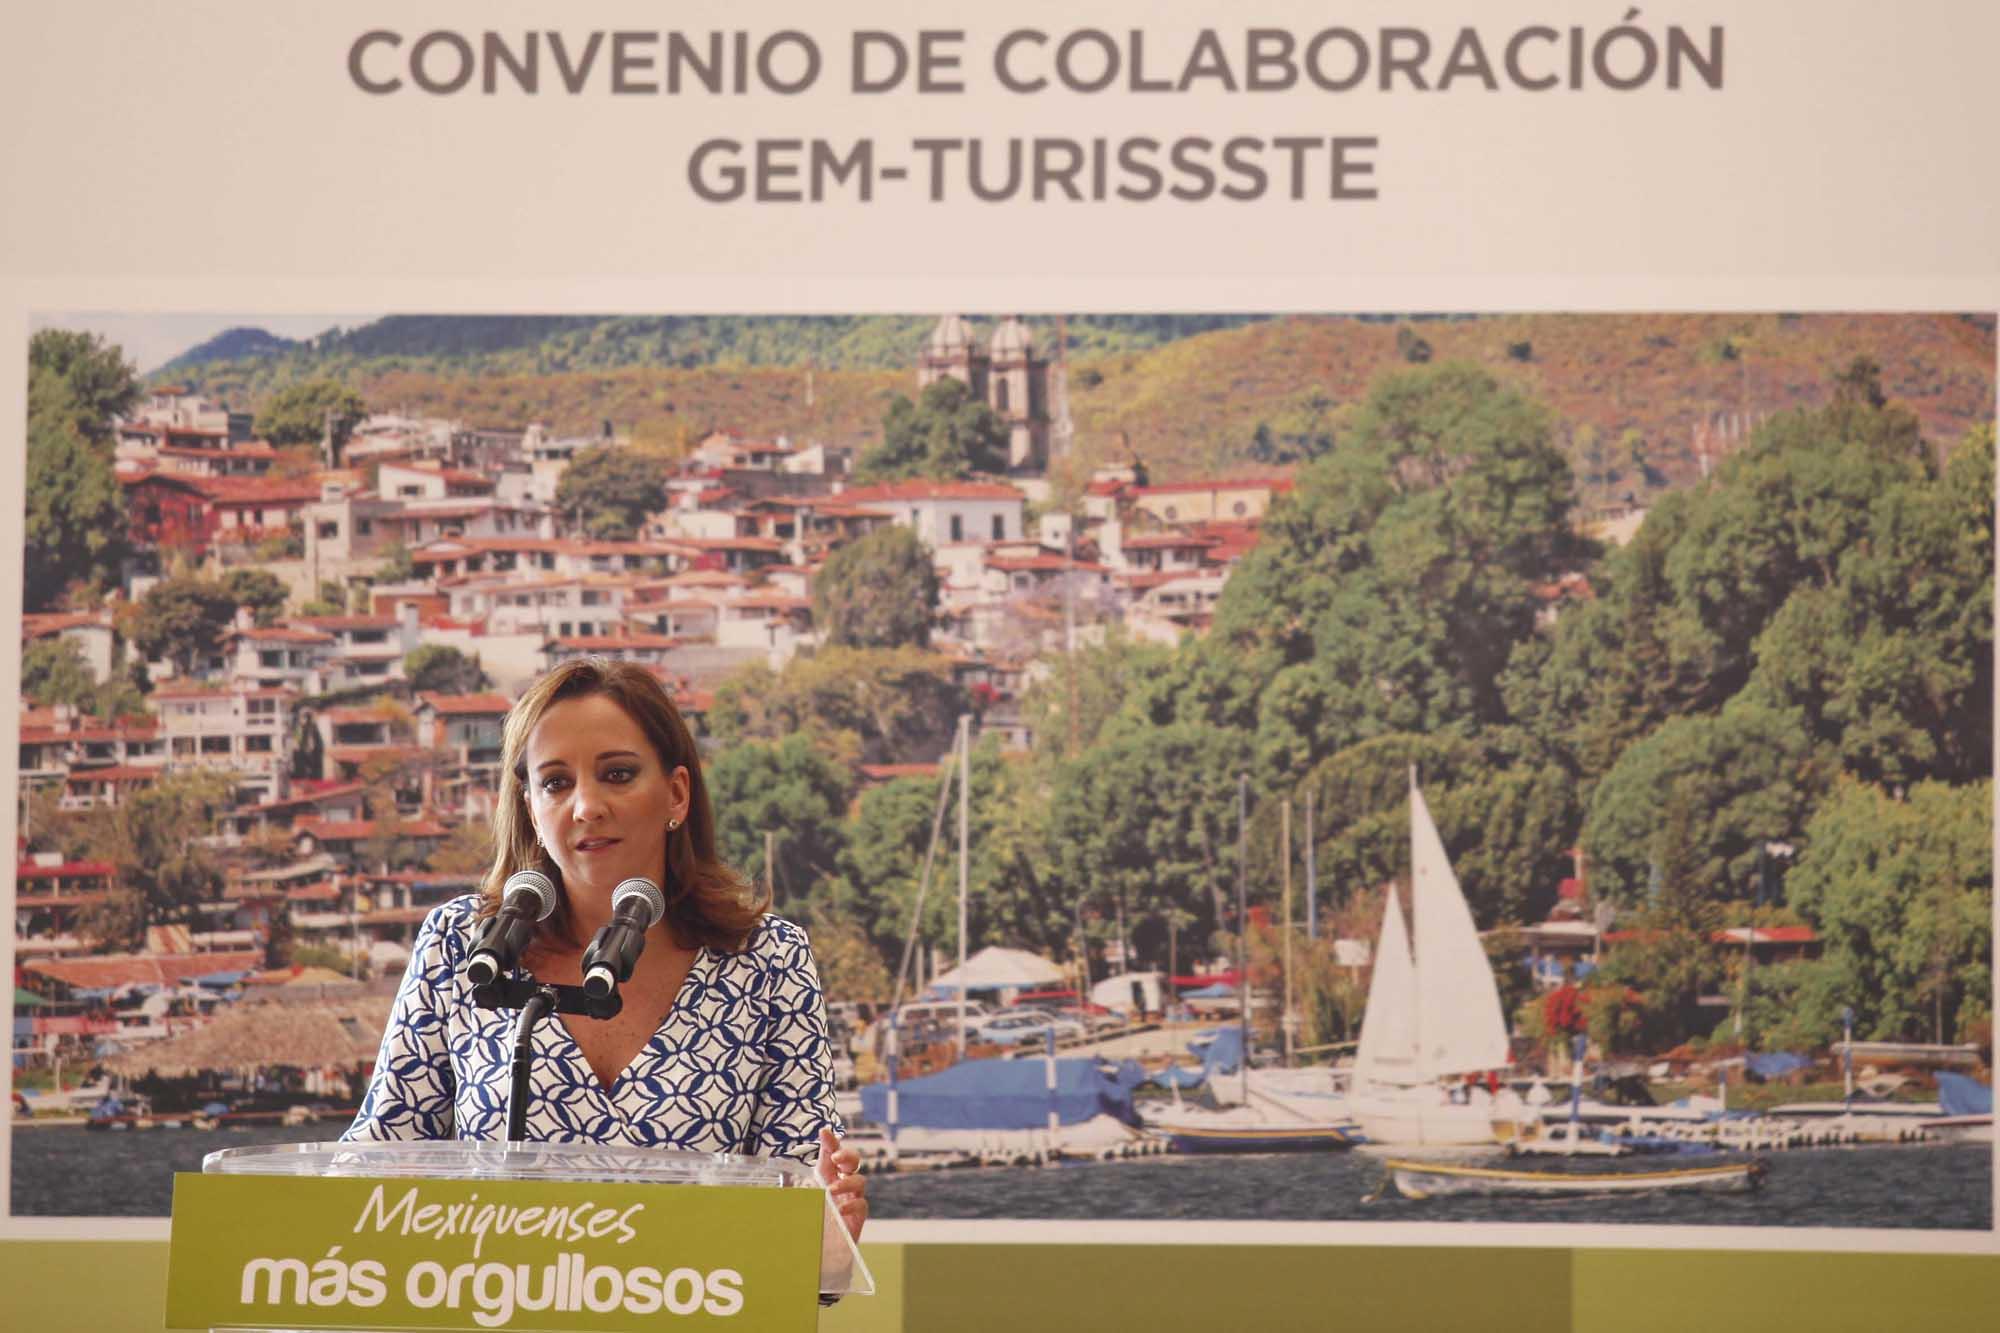 convenio colaboracion gem turissstejpg